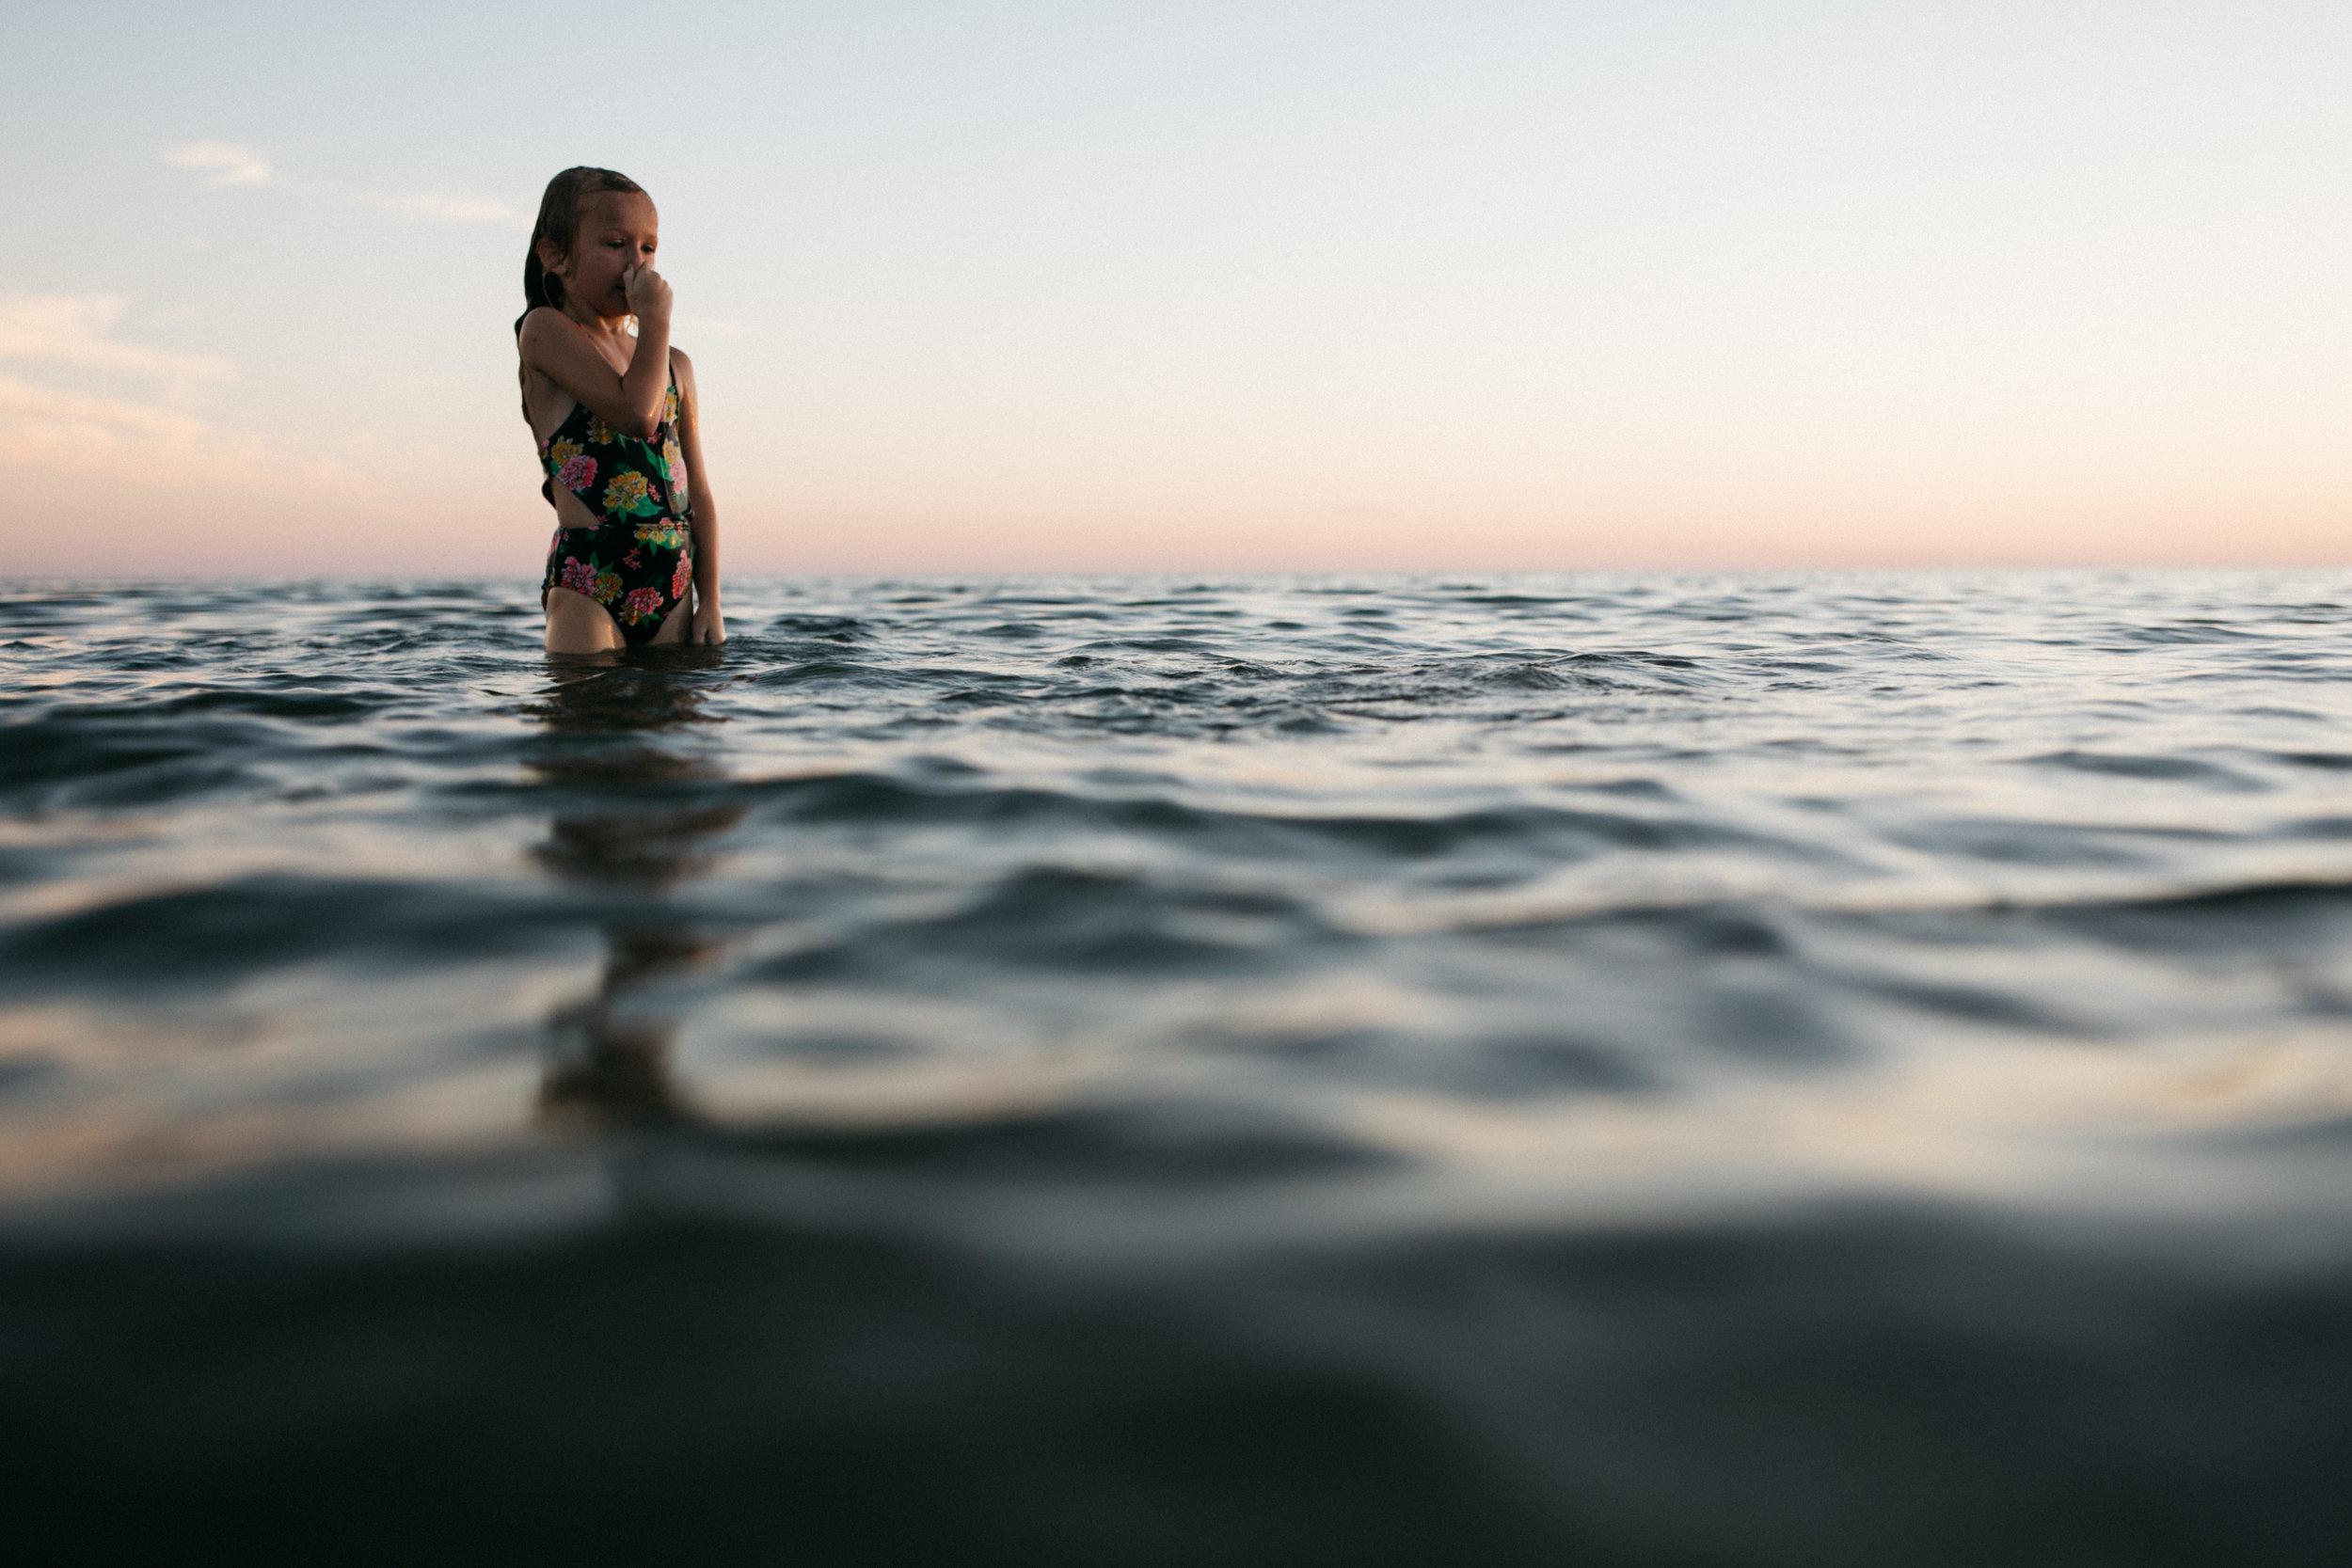 michigan-storytelling-photographer-ludington-beach-live-317.jpg